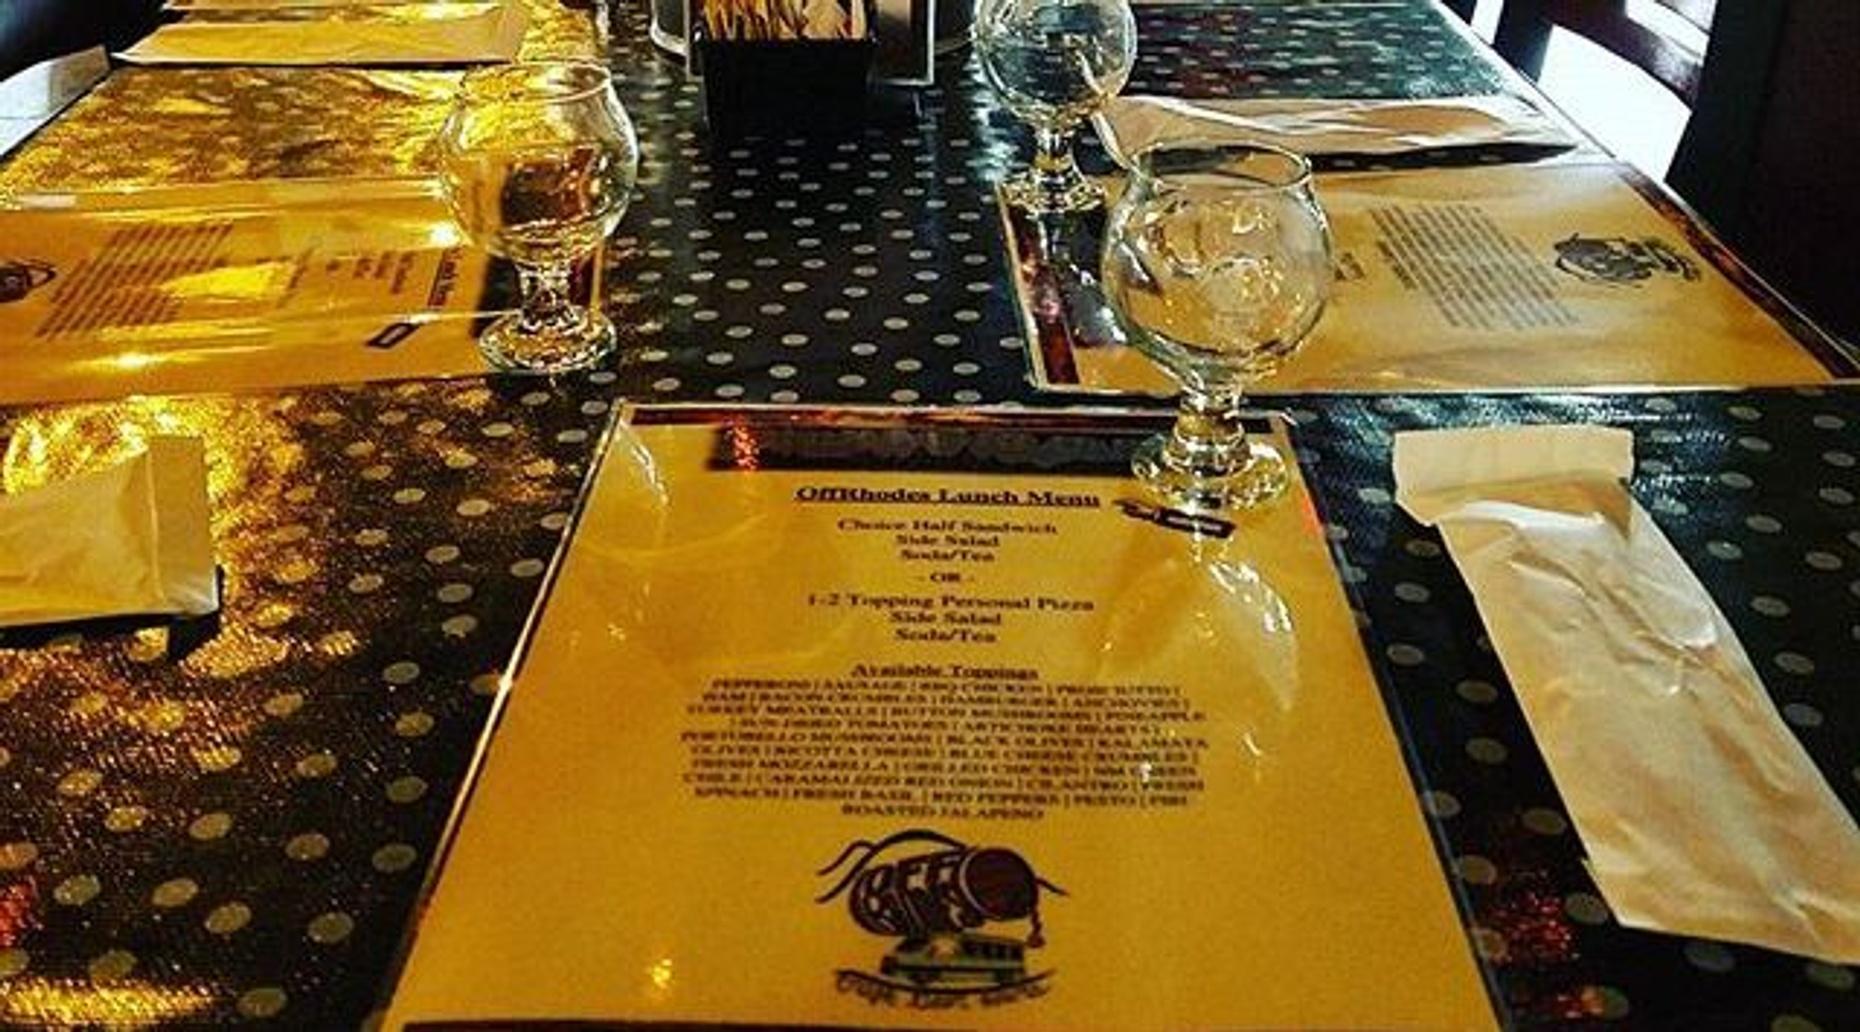 San Antonio Three Breweries Tour